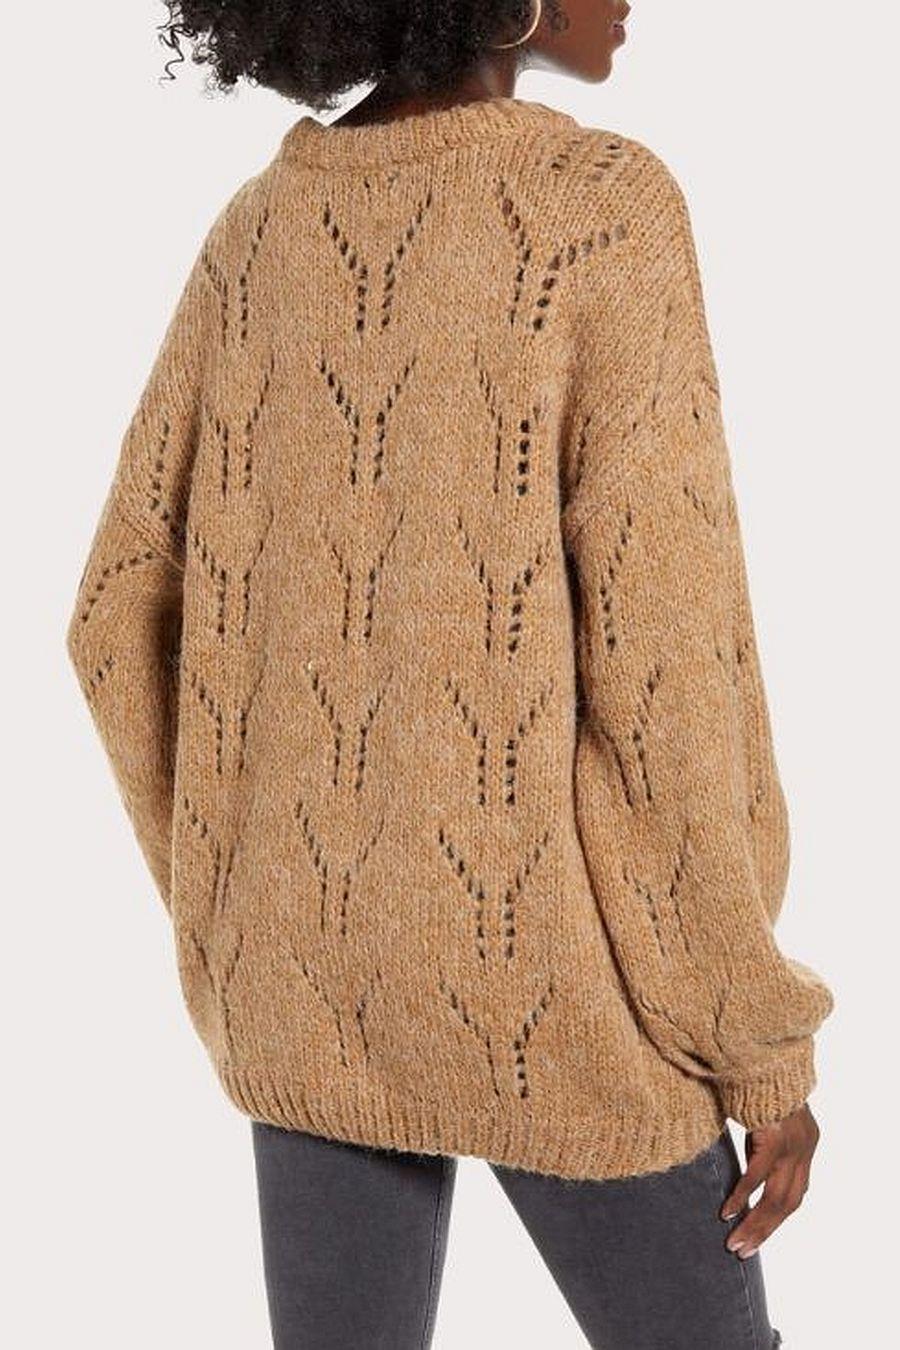 J.O.A. Balloon Sleeve Sweater